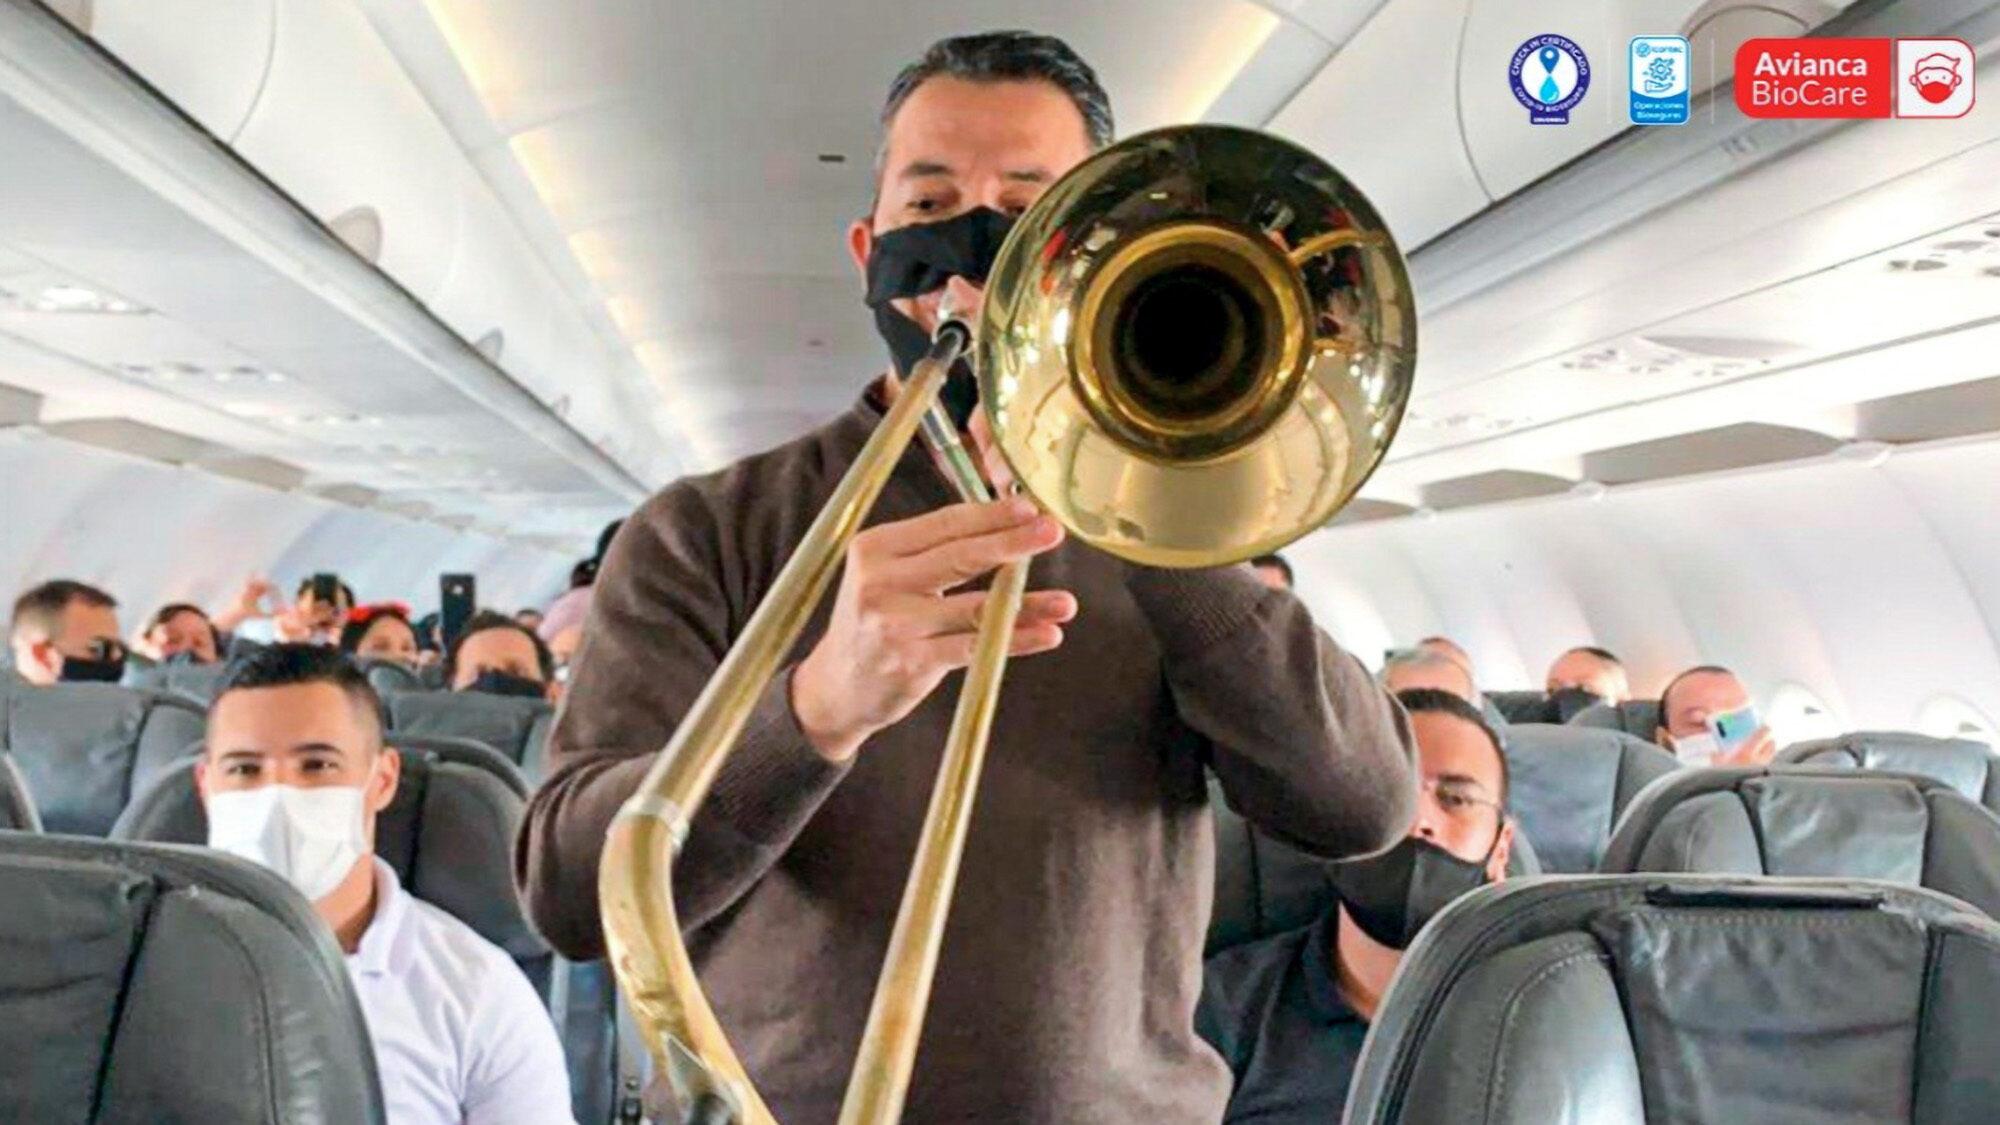 The concert on the plane. (@Avianca/Newsflash)